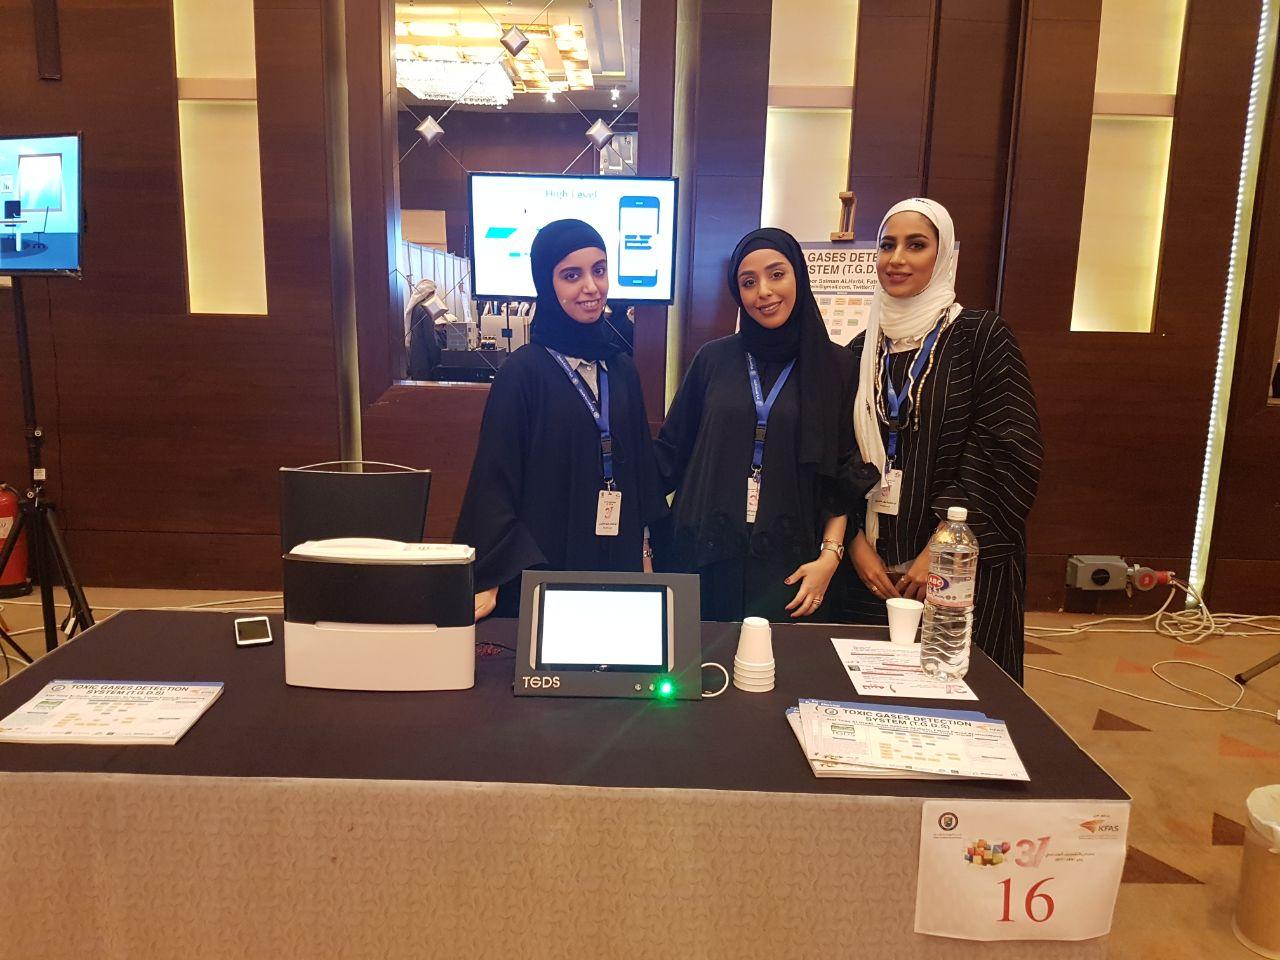 Kuwait University's 31st Engineering Design Exhibition